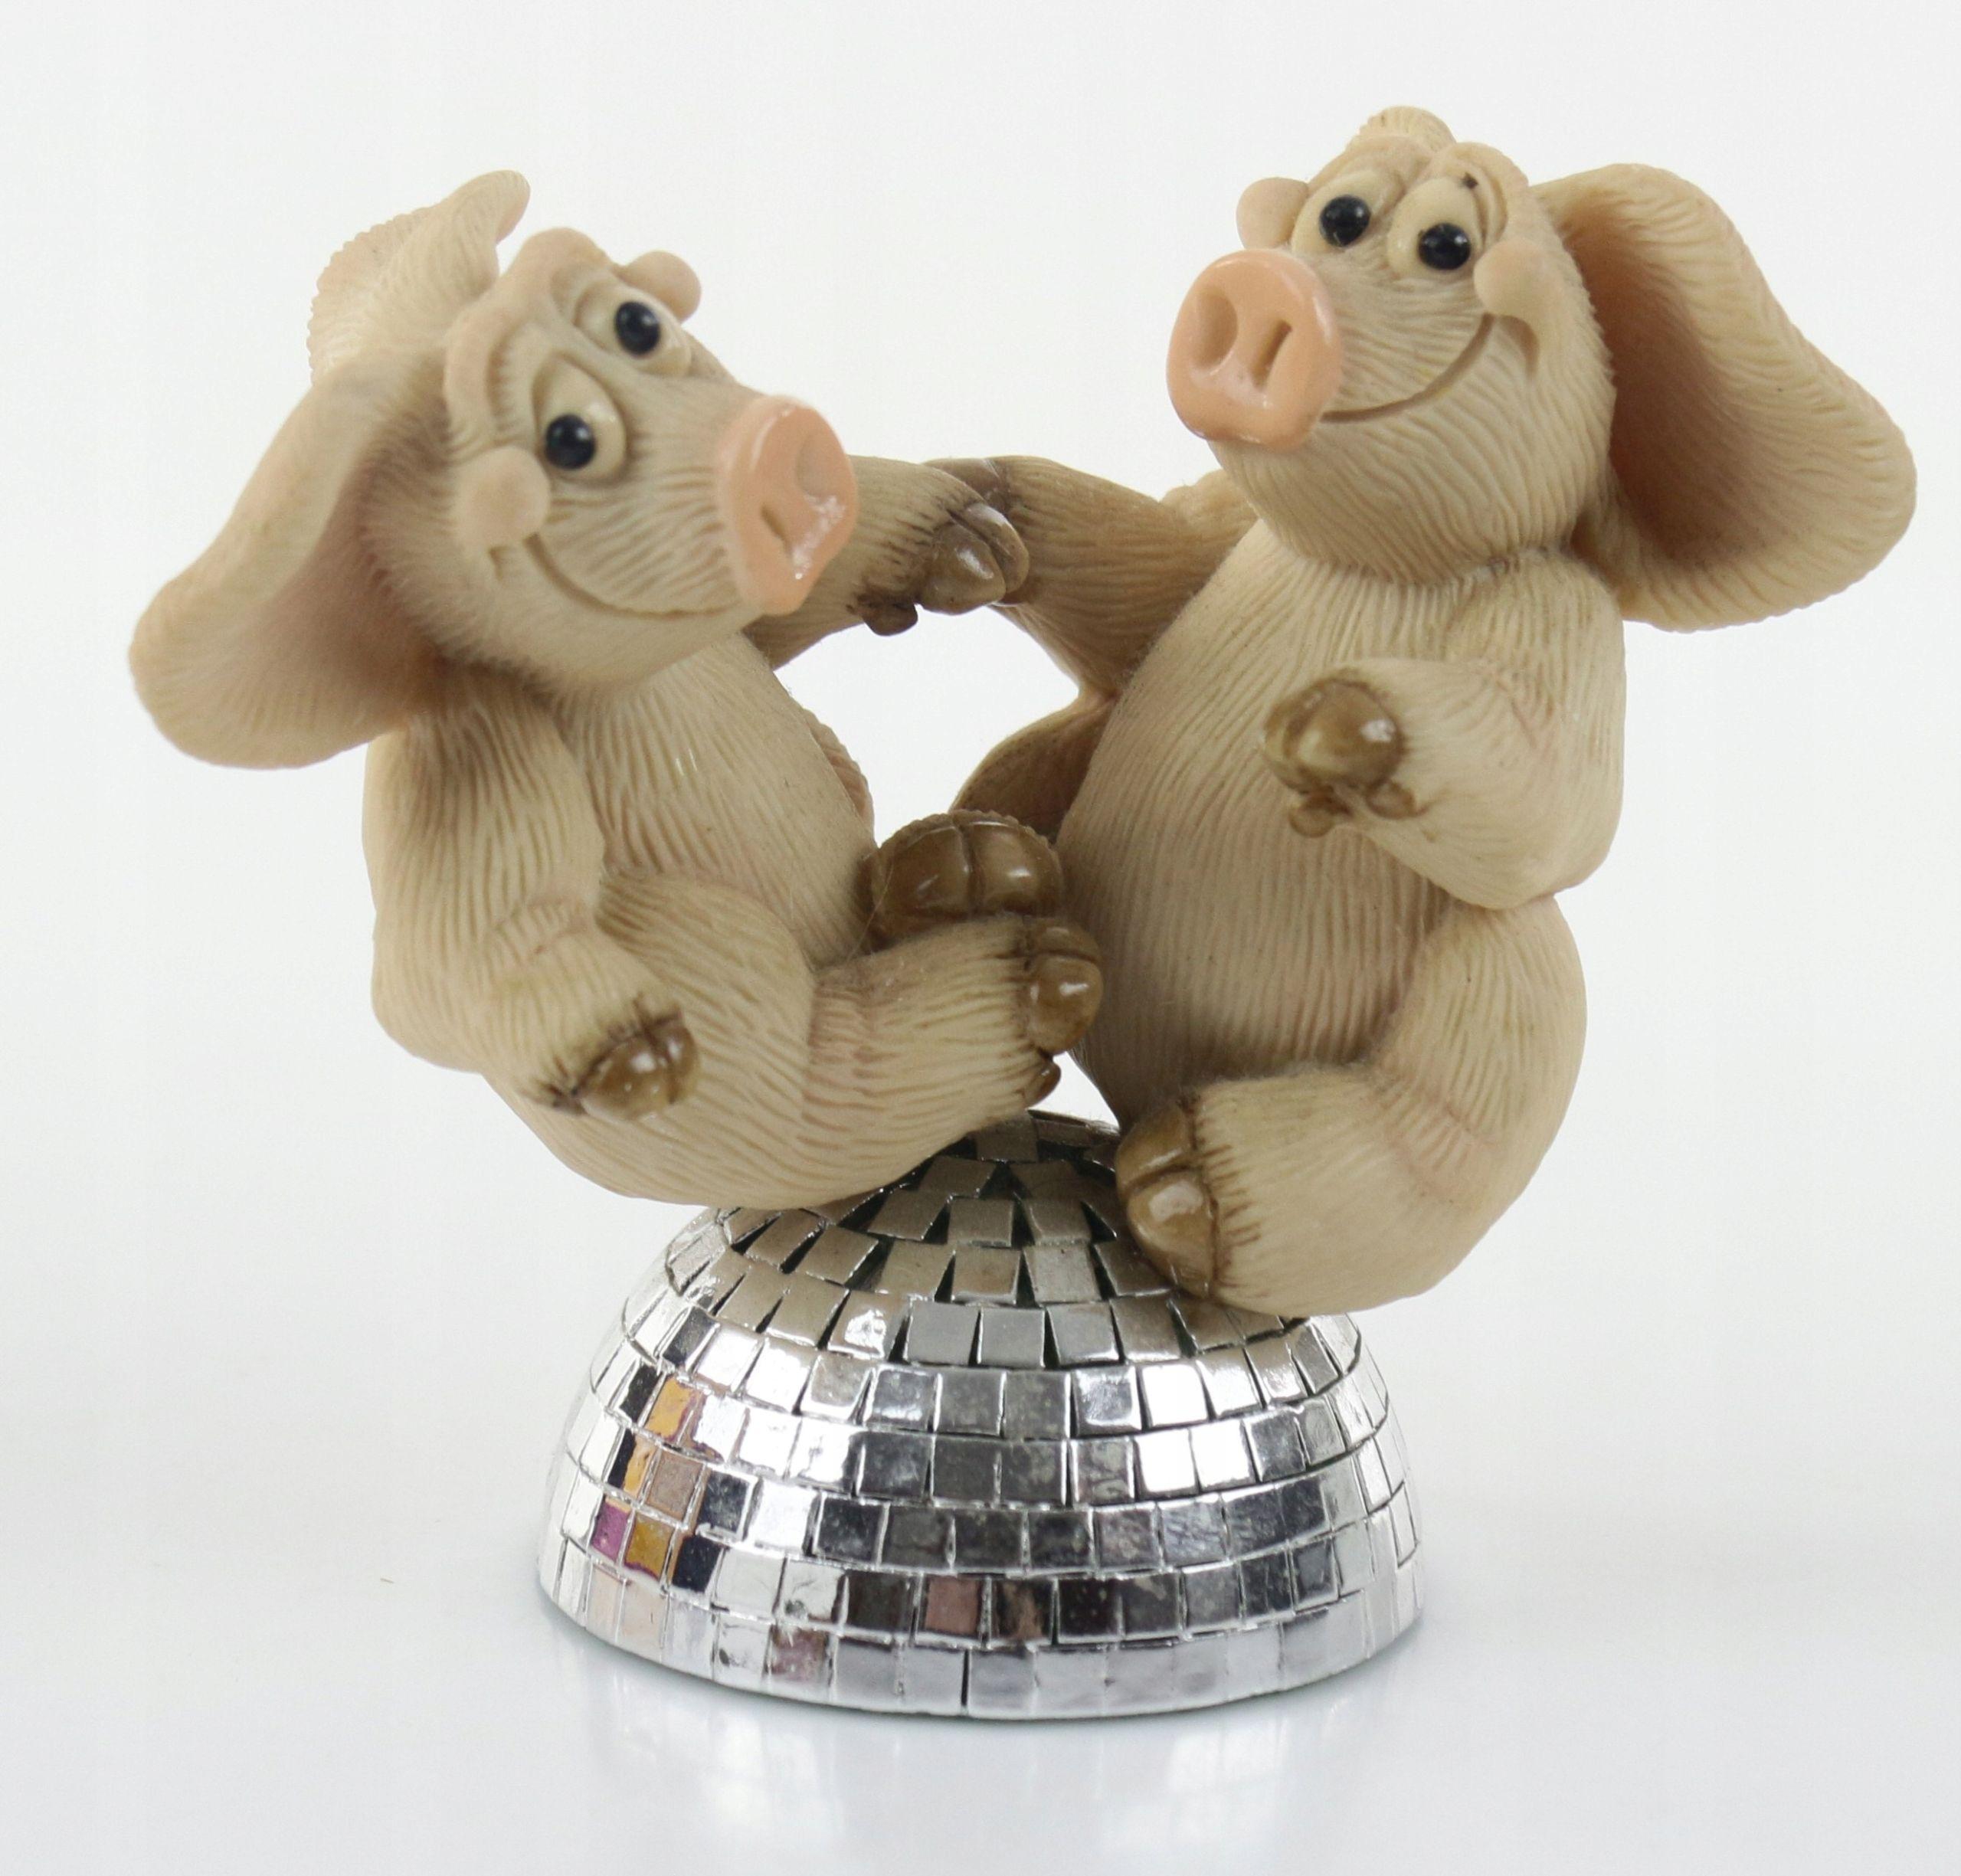 Pchli Targ Figurki Swinki Piggin 7917827061 Oficjalne Archiwum Allegro Teddy Bear Teddy Animals